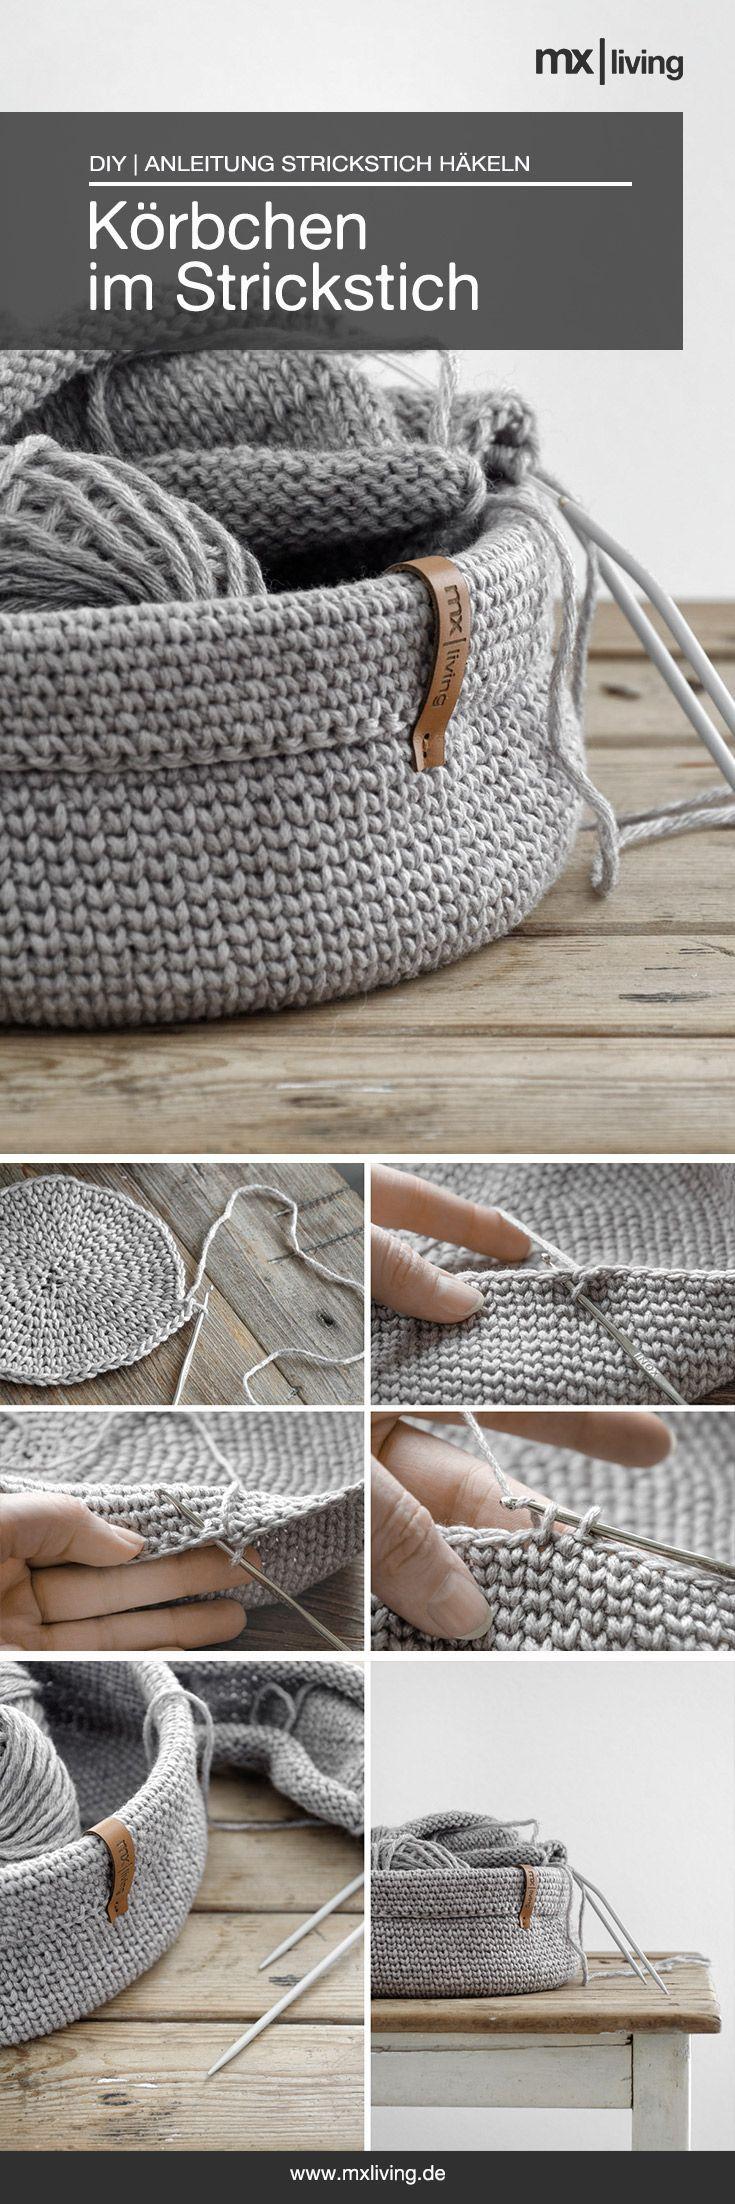 DIY | Anleitung Körbchen im Strickstich häkeln - mxliving #crochetgifts